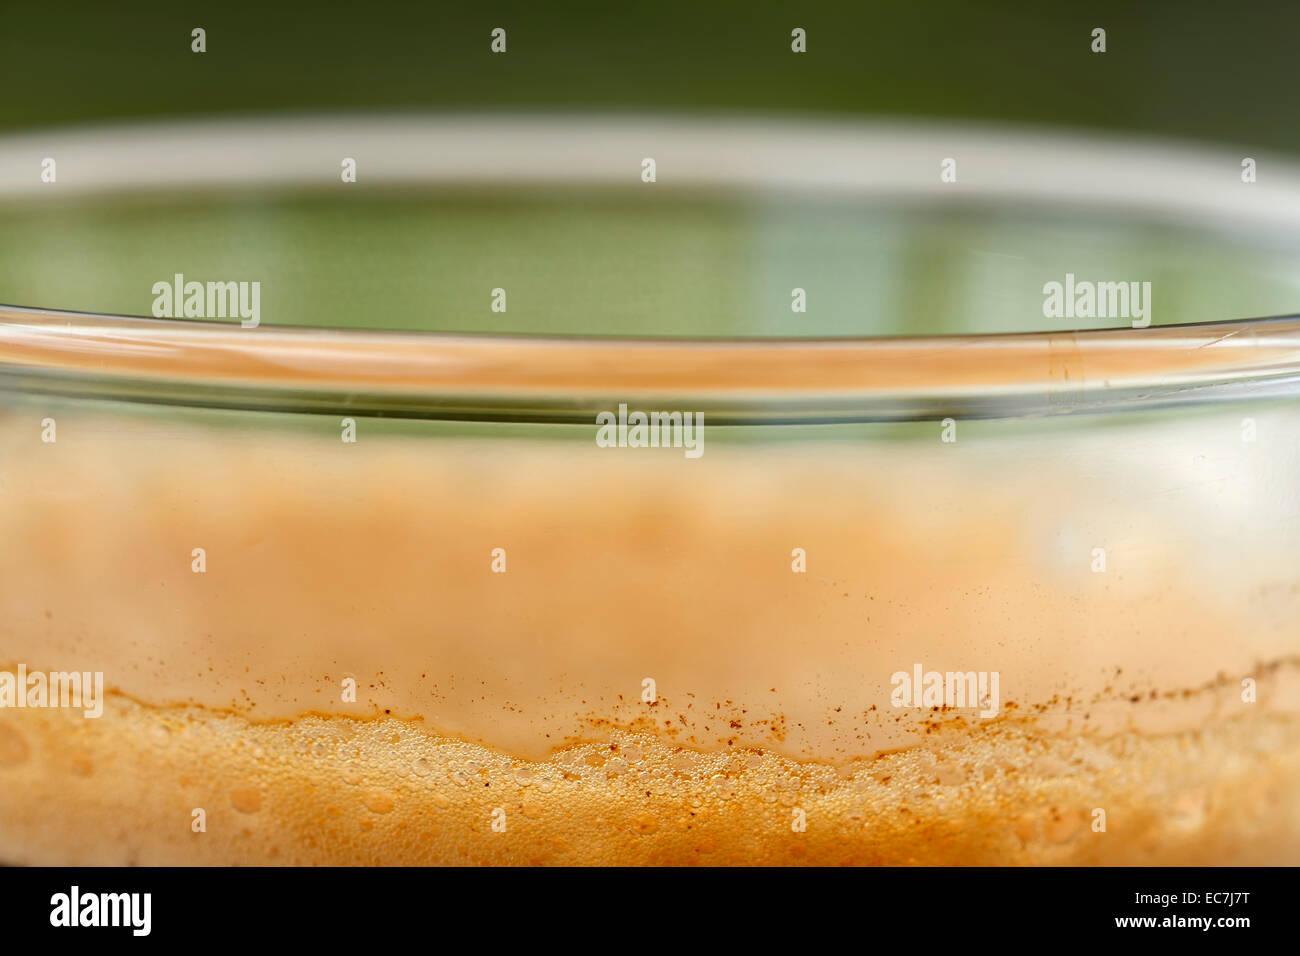 Kaffee Glas Schaum extrem nah oben, Makroaufnahme Stockbild